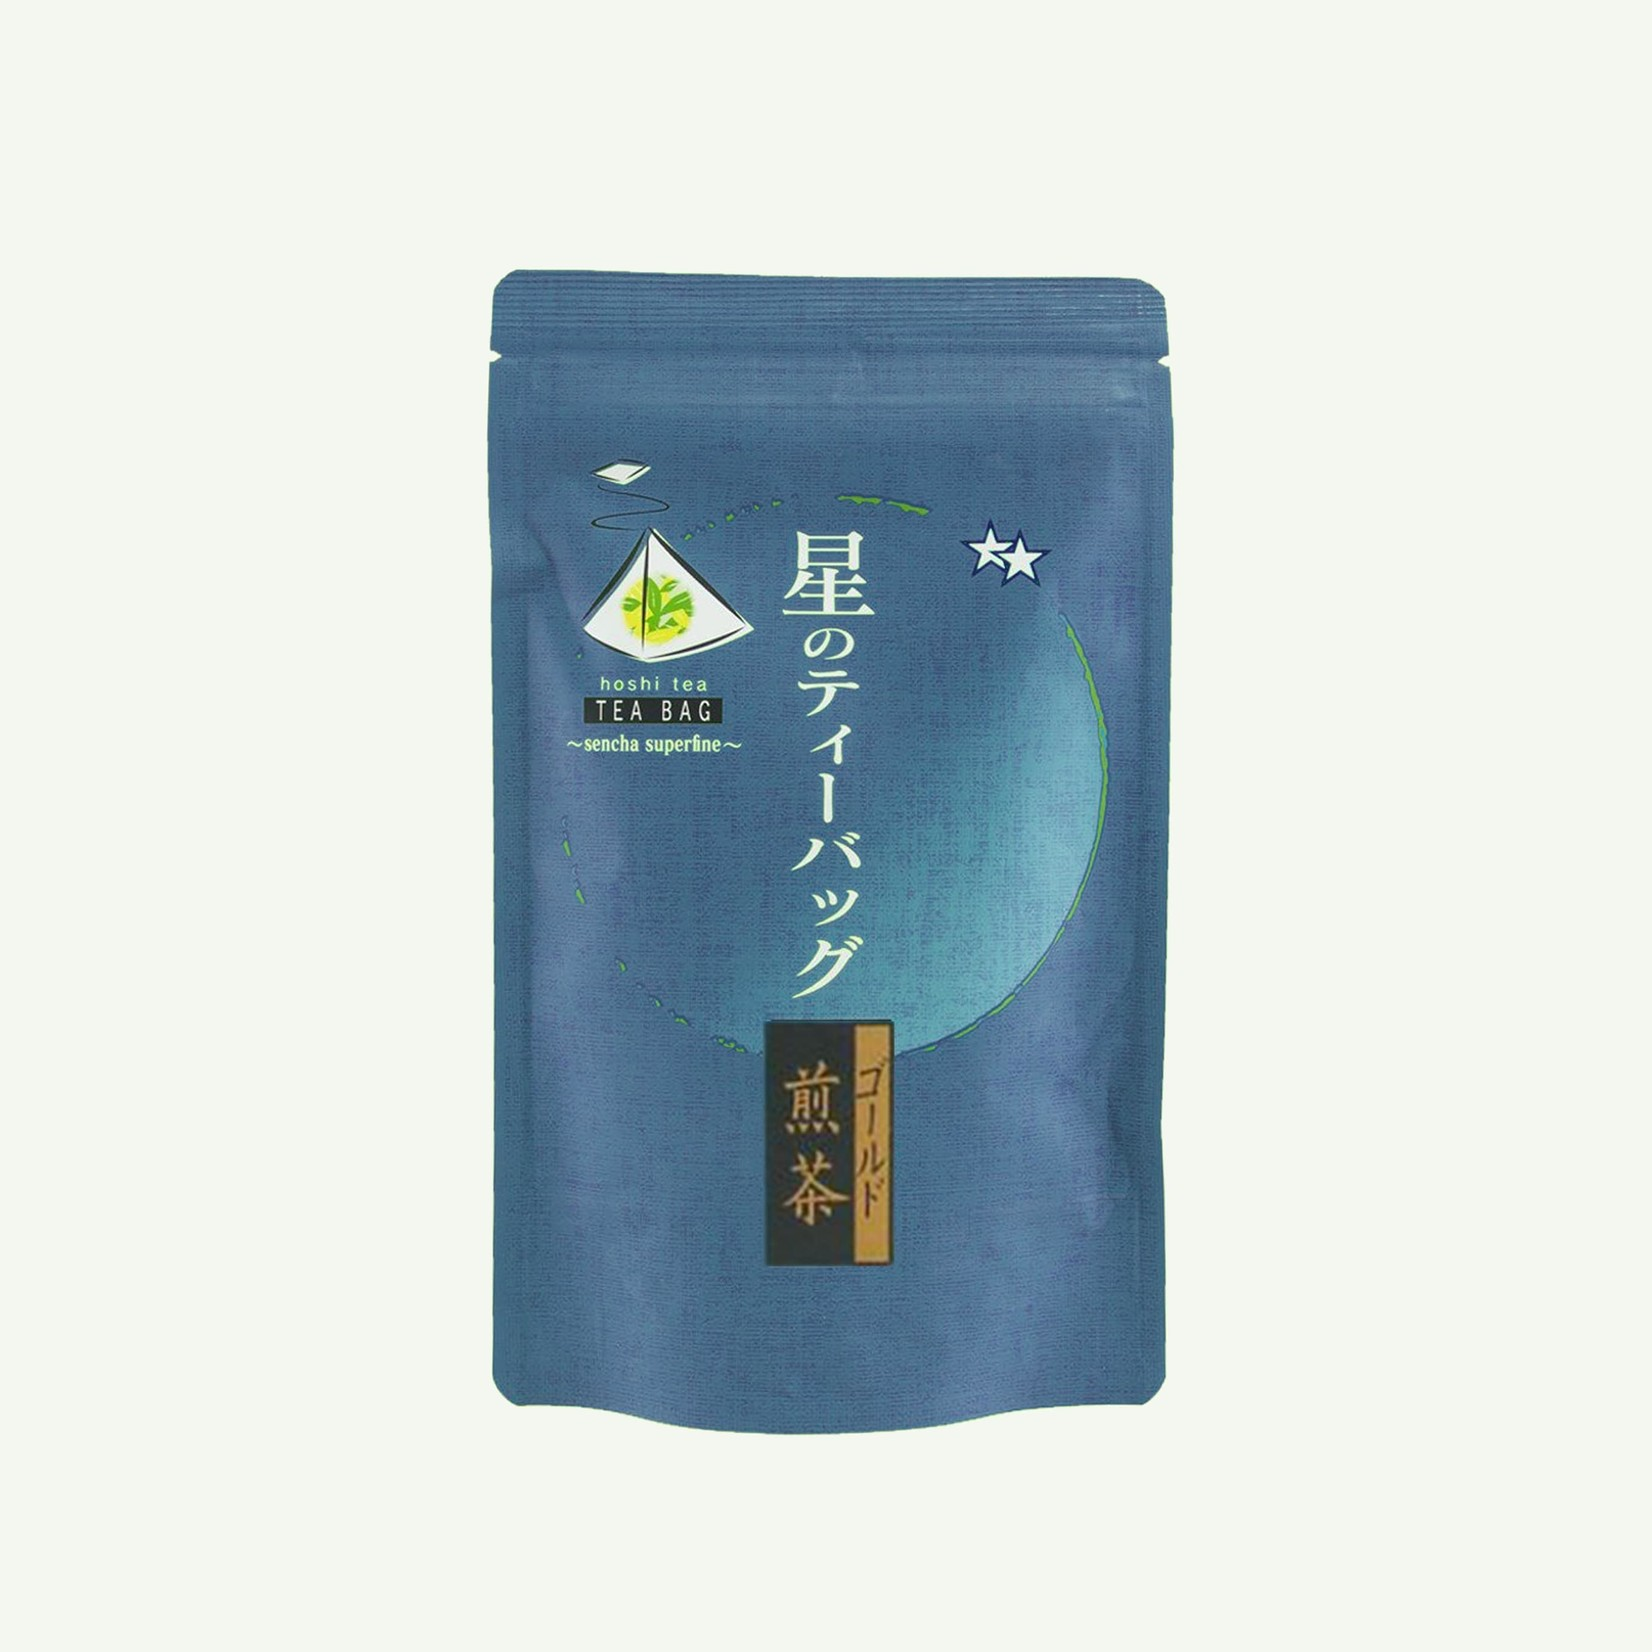 Japan Sencha Gold Hoshino 15x5g - Theebuiltjes